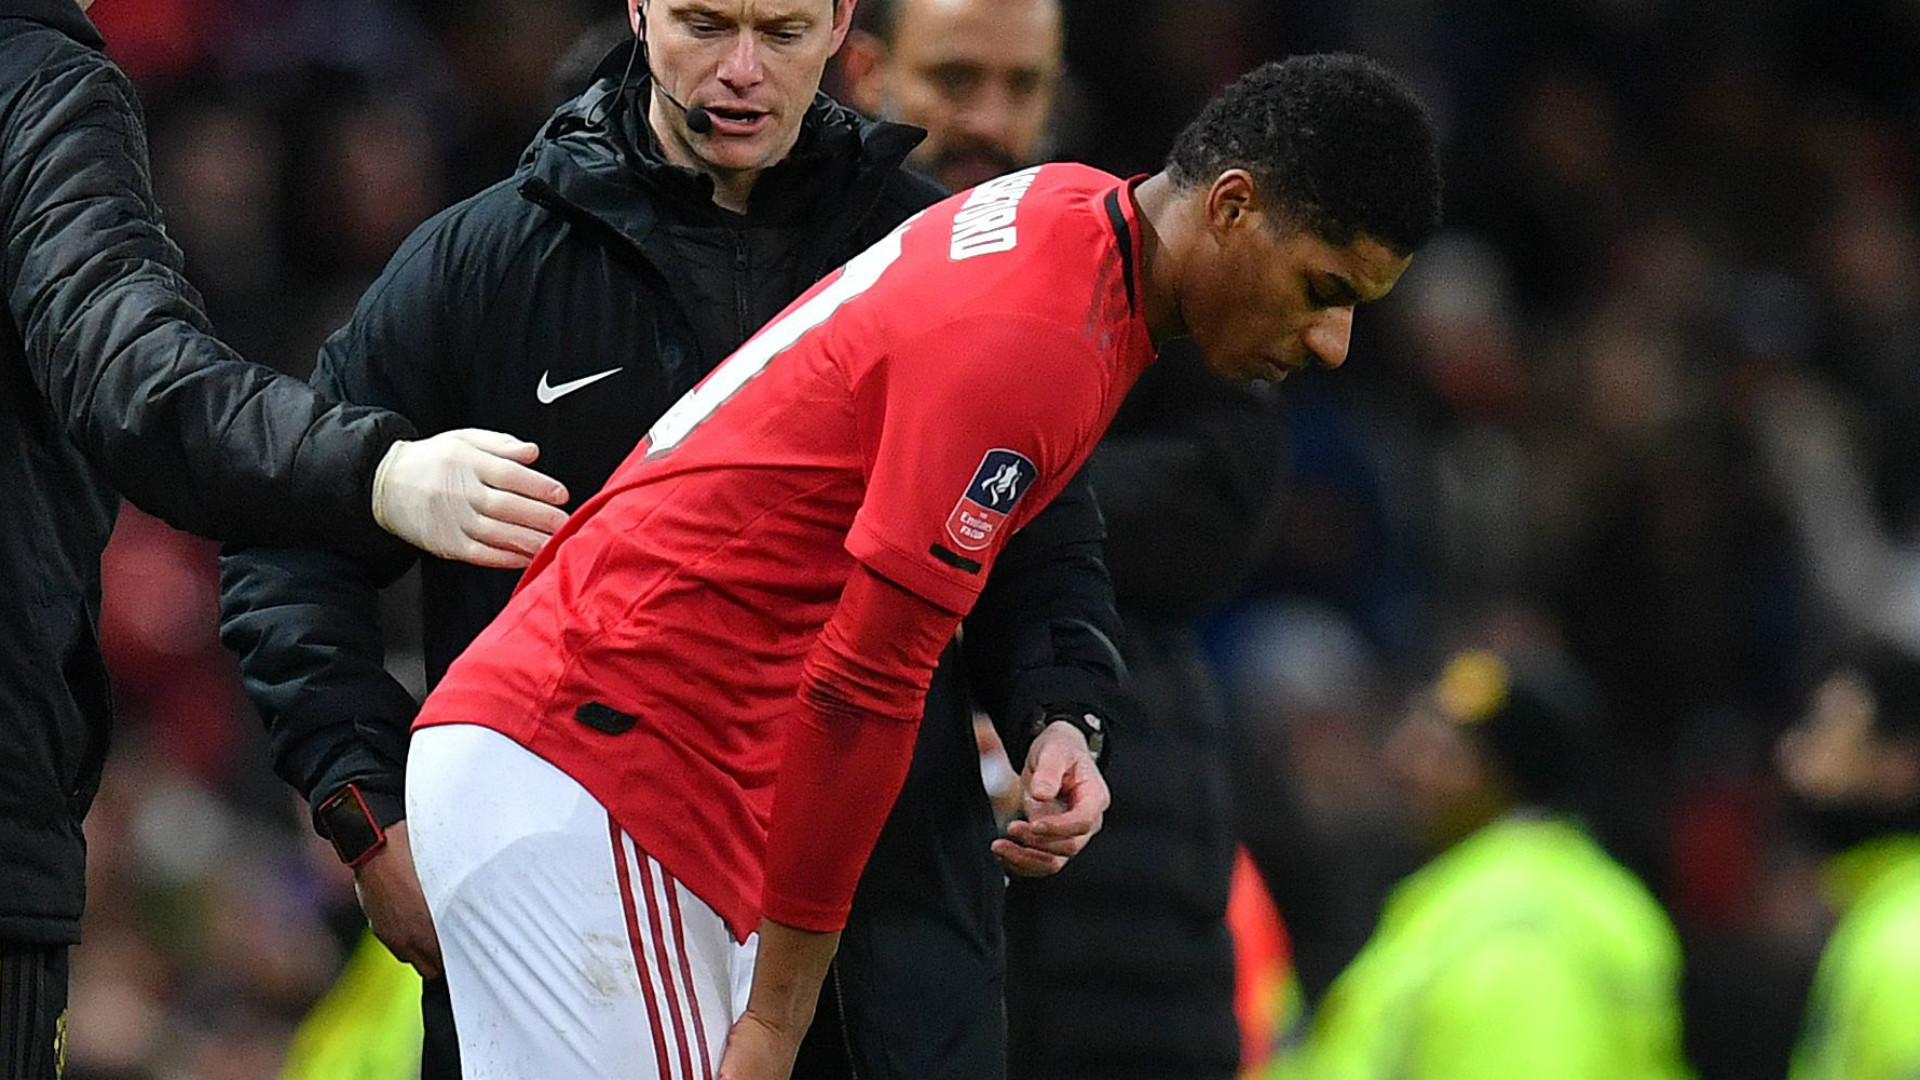 Rashford insists he will play again for Man Utd this season despite Solskjaer comments